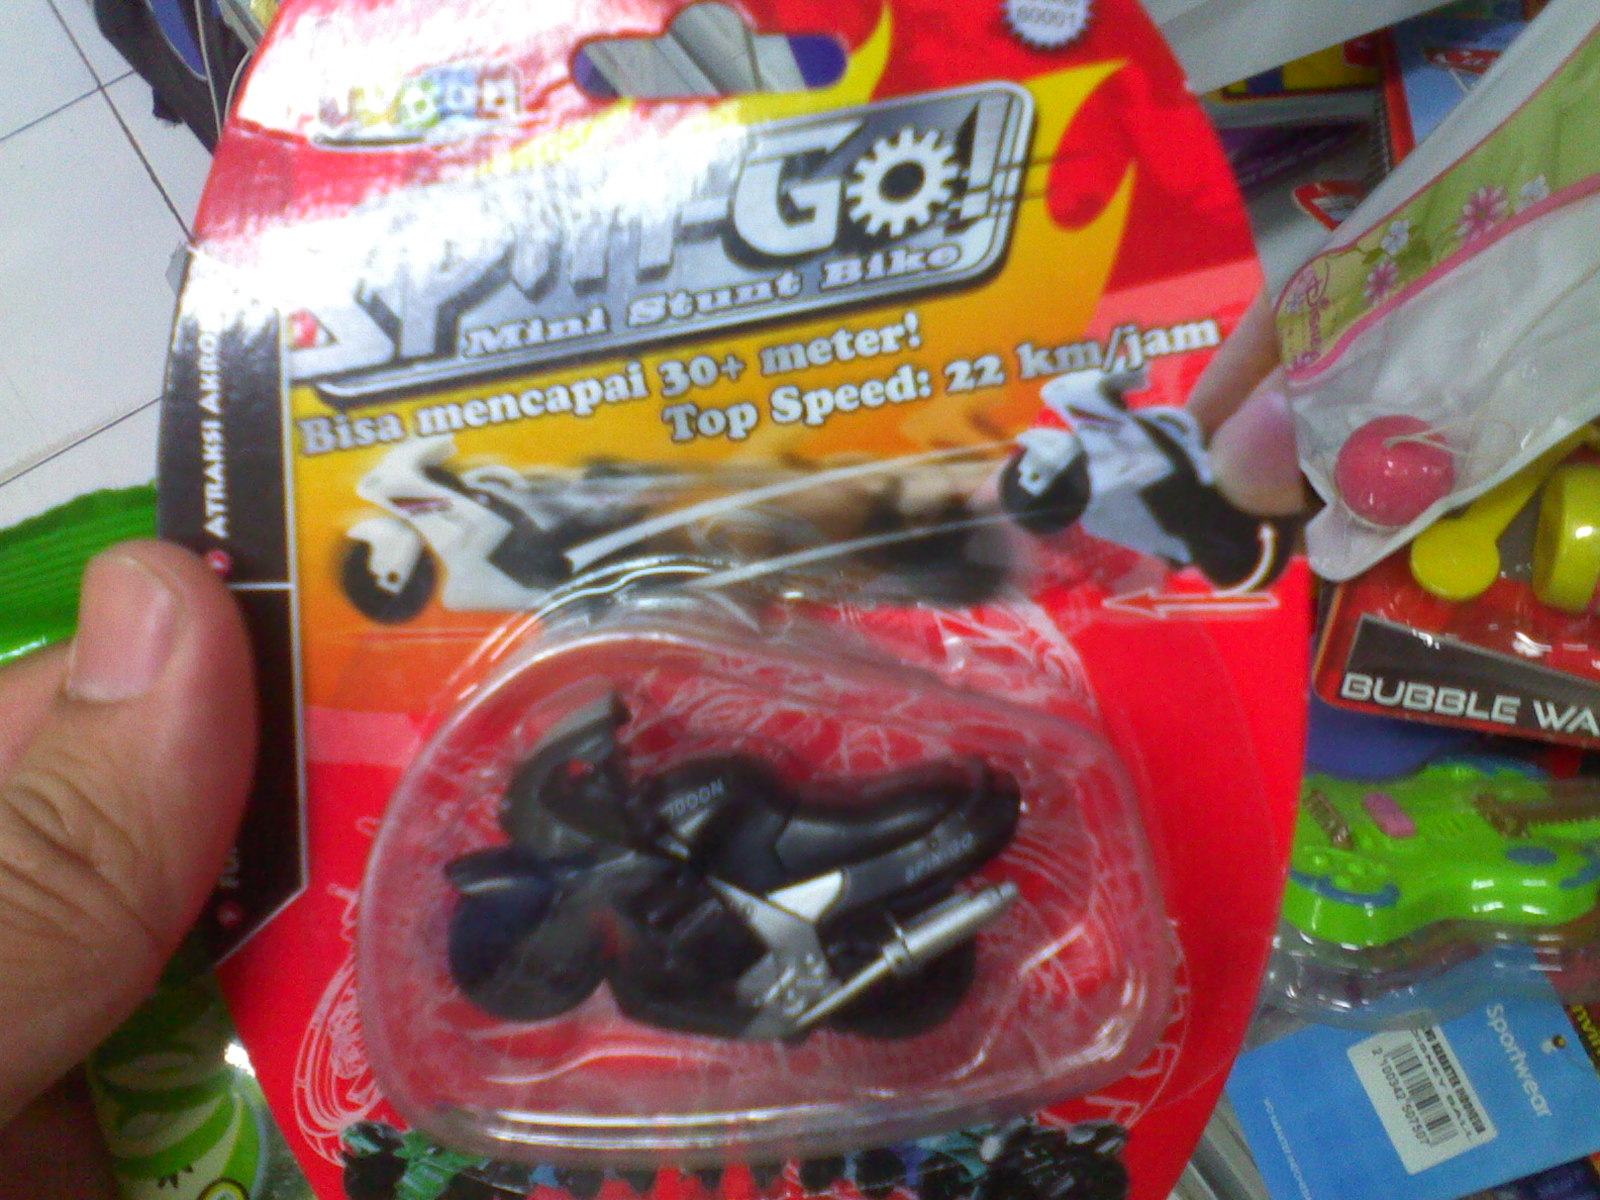 Mainan Baru Spin Go Ramboeistblast